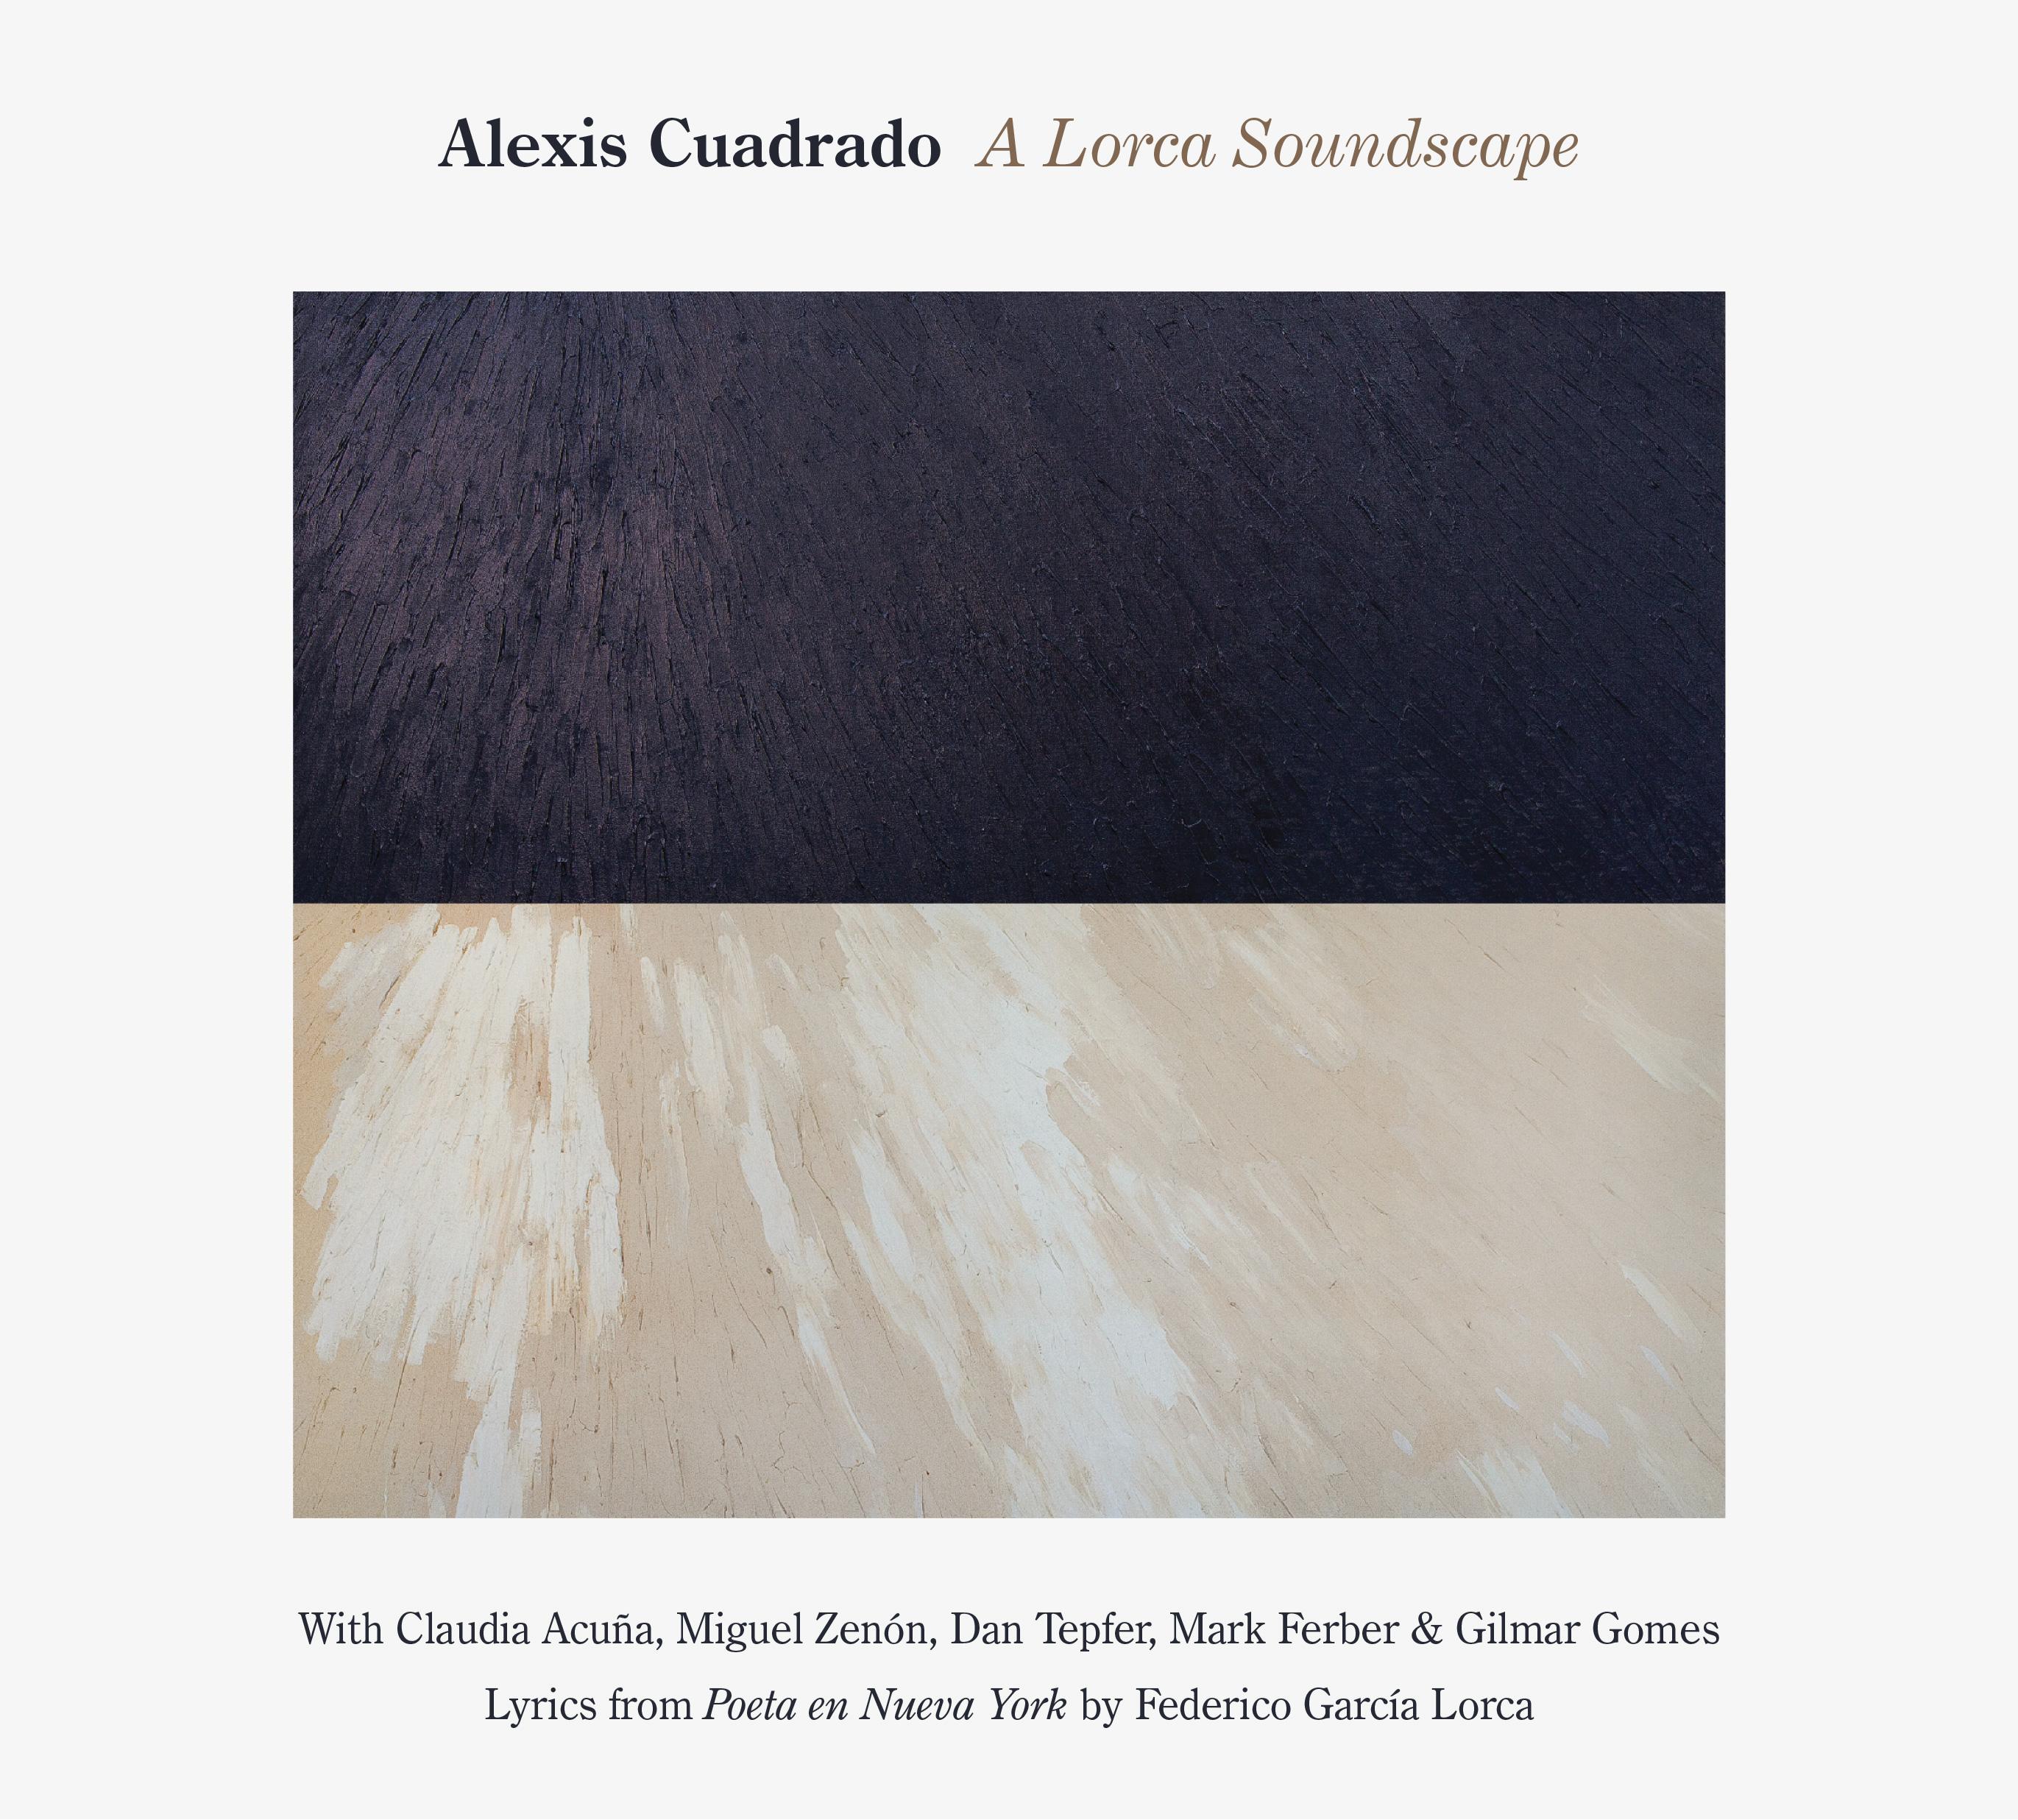 A lorca soundscape cover